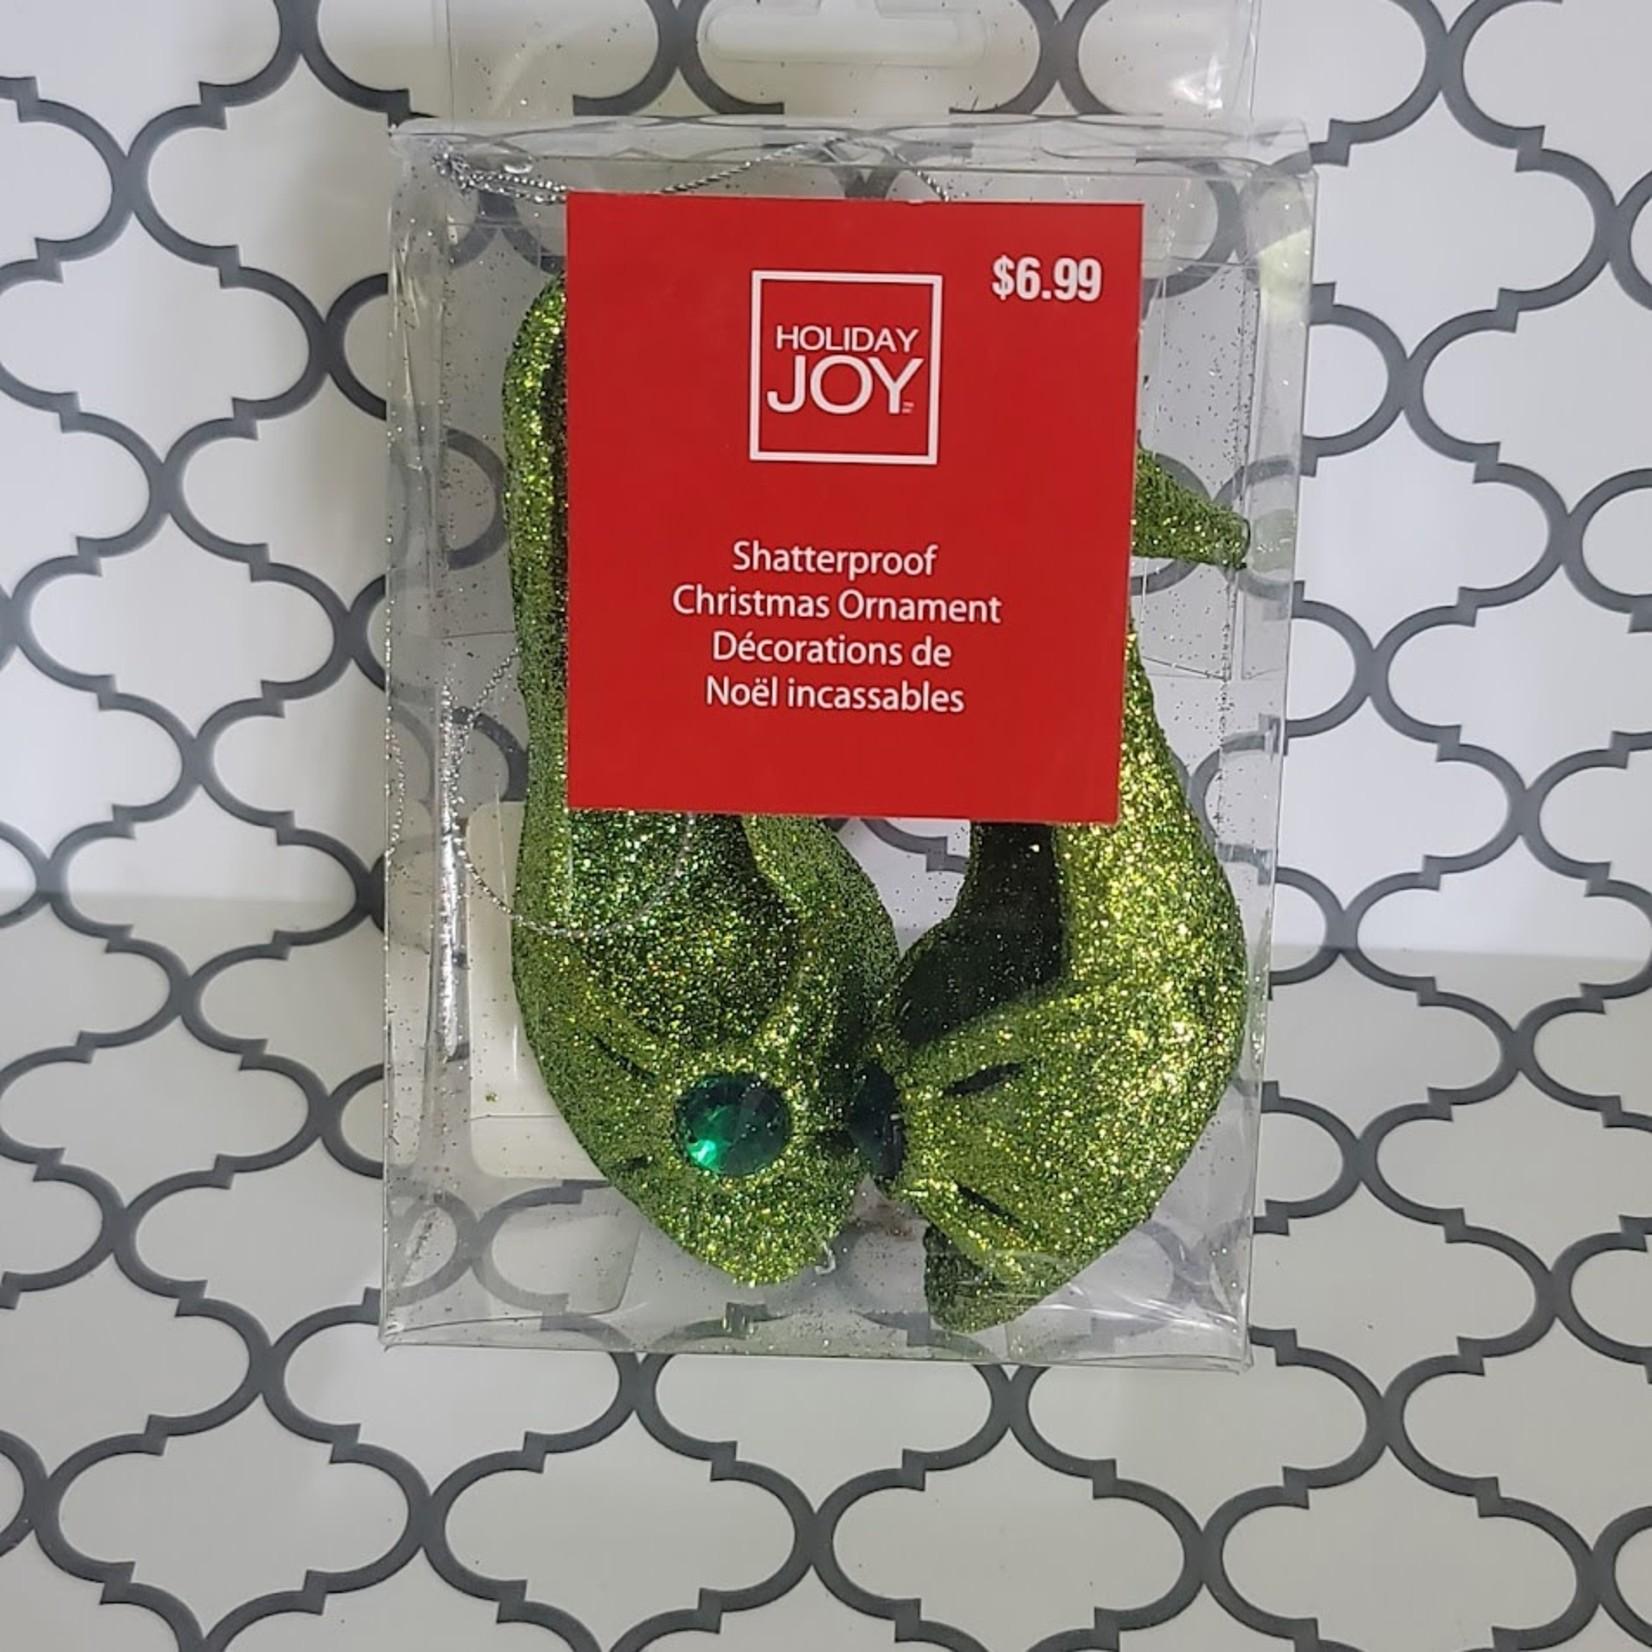 Shatterproof Ornaments - Slippers